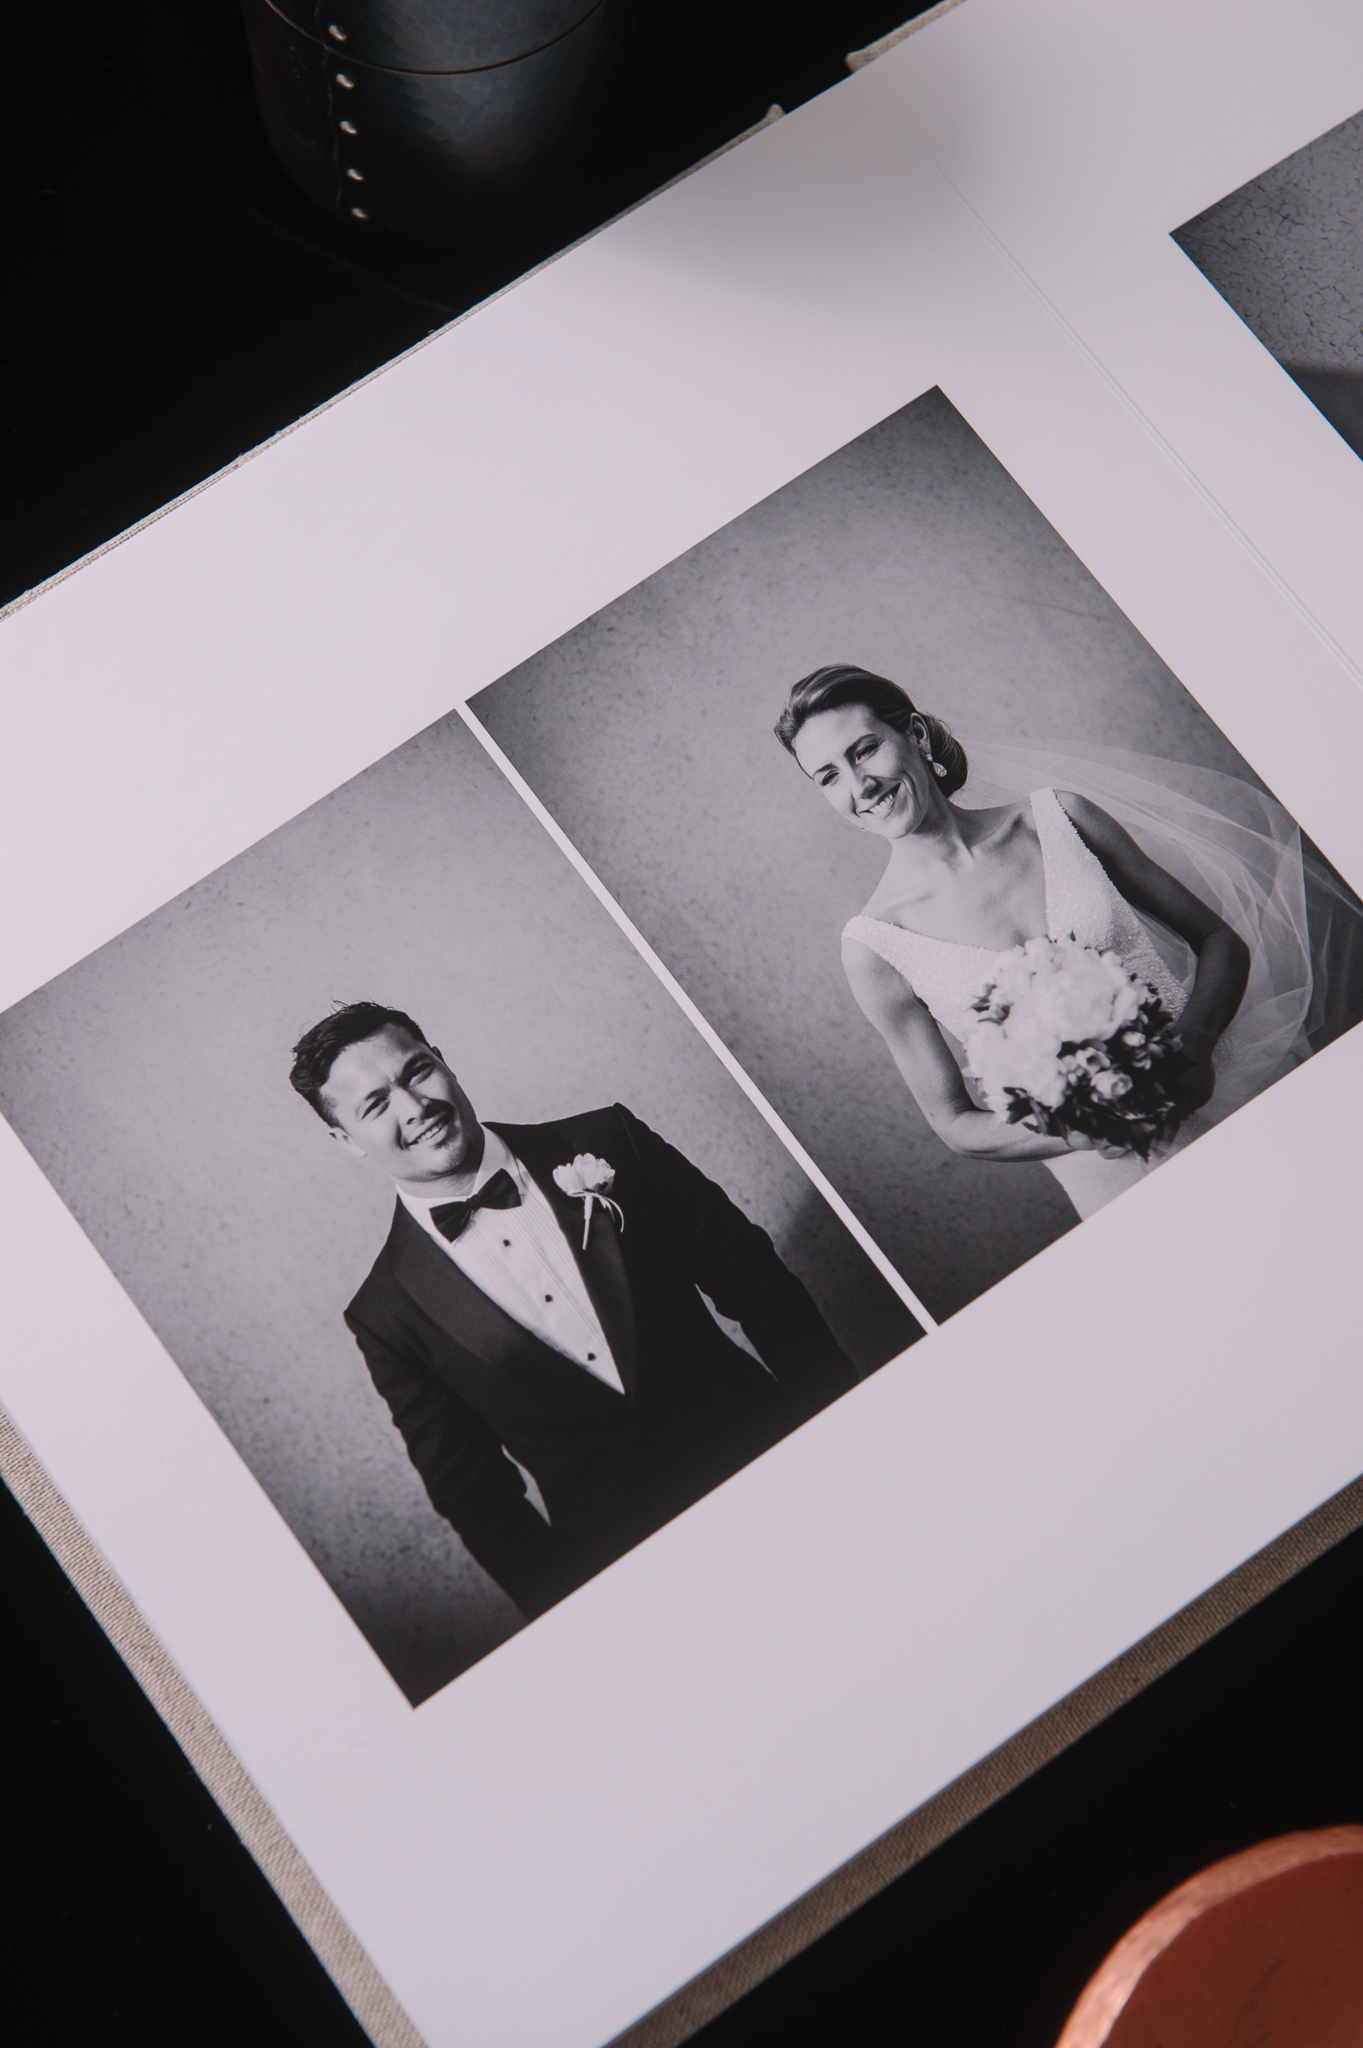 Jonathan_Wherrett_Wedding_Album_034.jpg